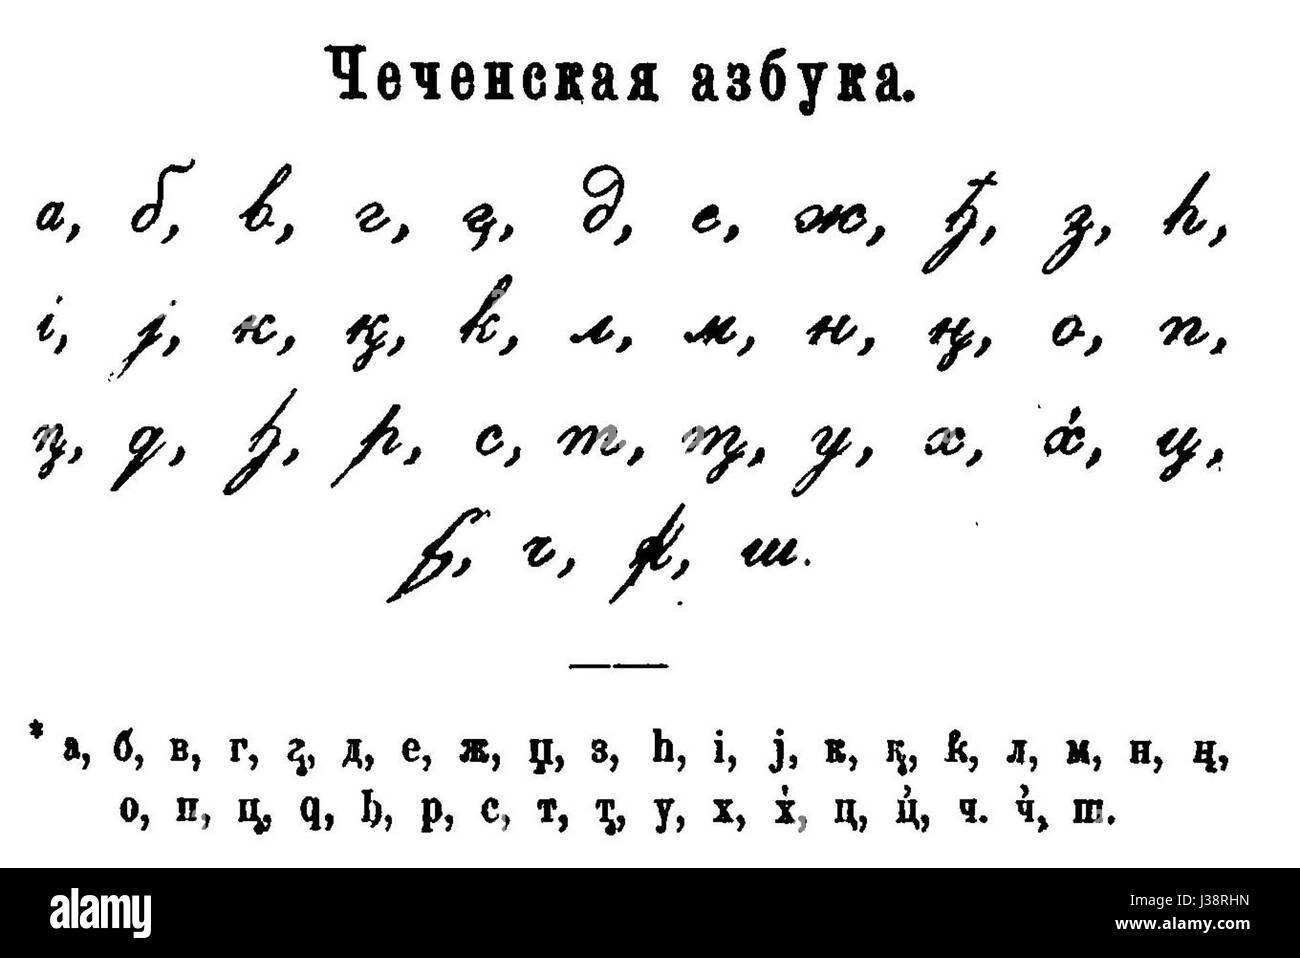 Chechen alphabet by Uslar - Stock Image